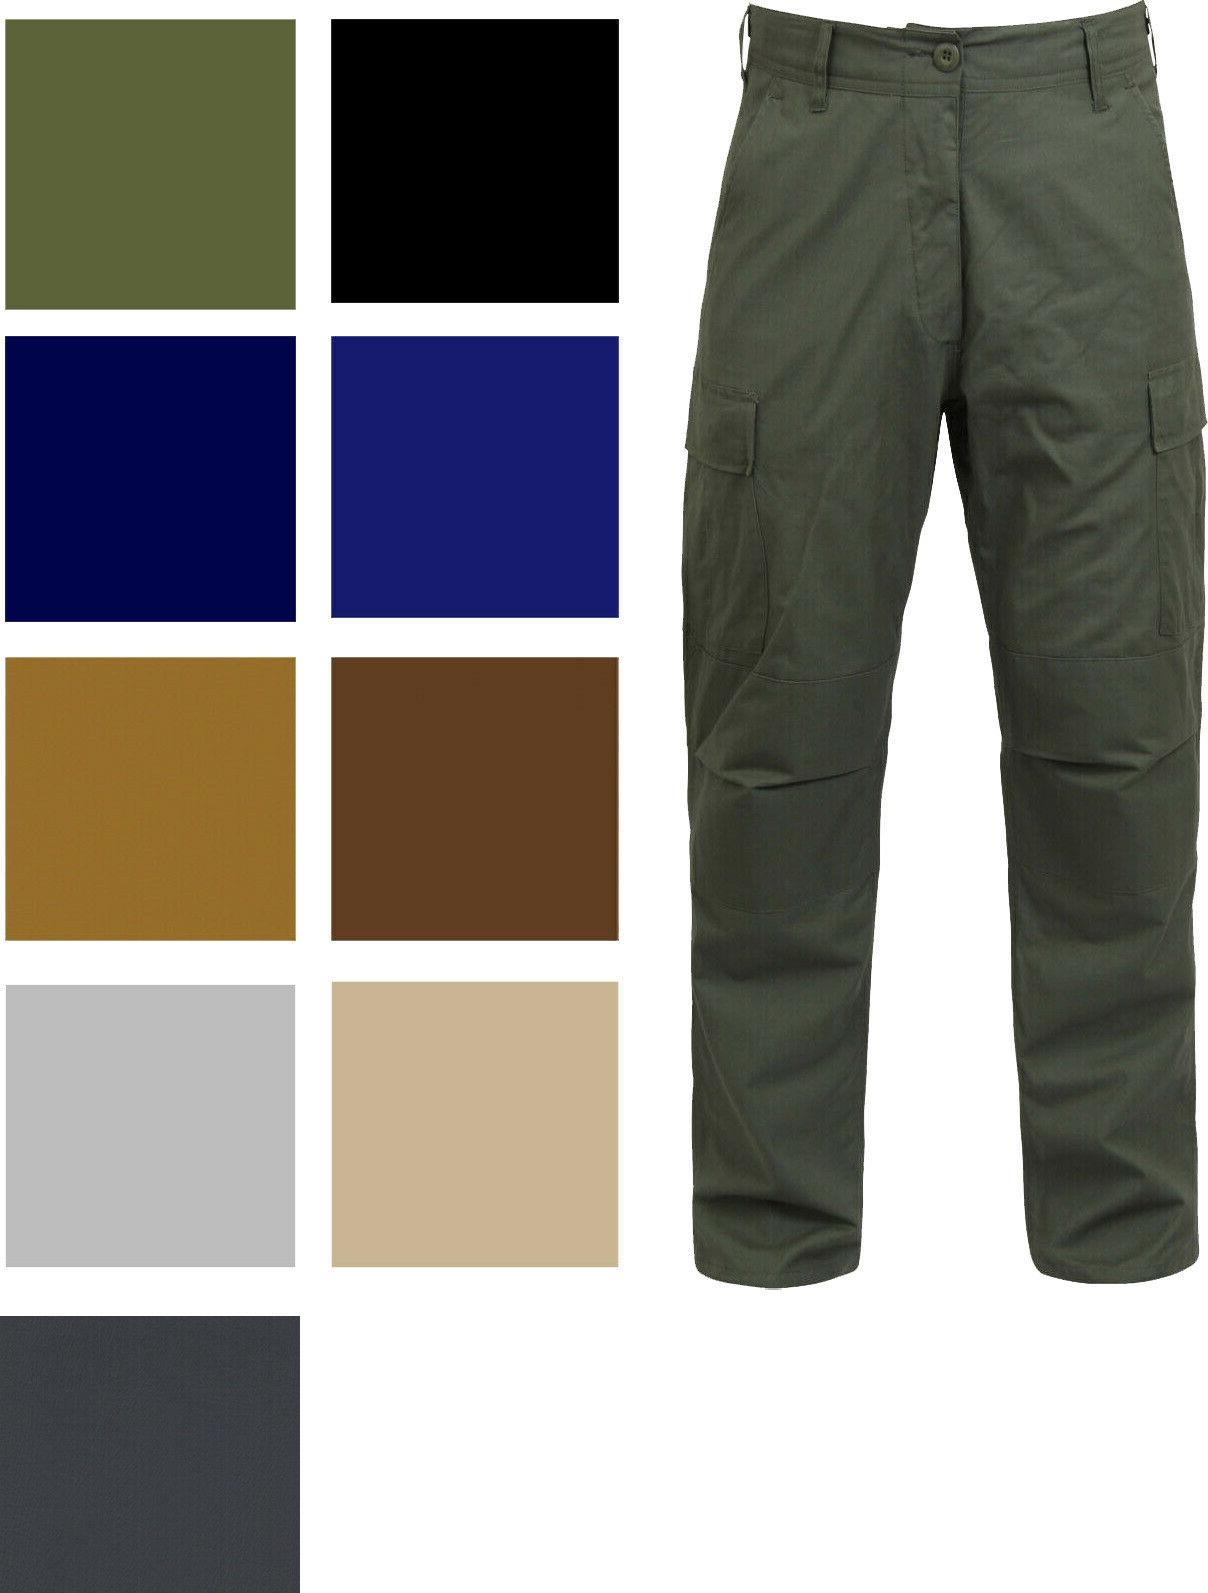 tactical bdu cargo pants military uniform trousers